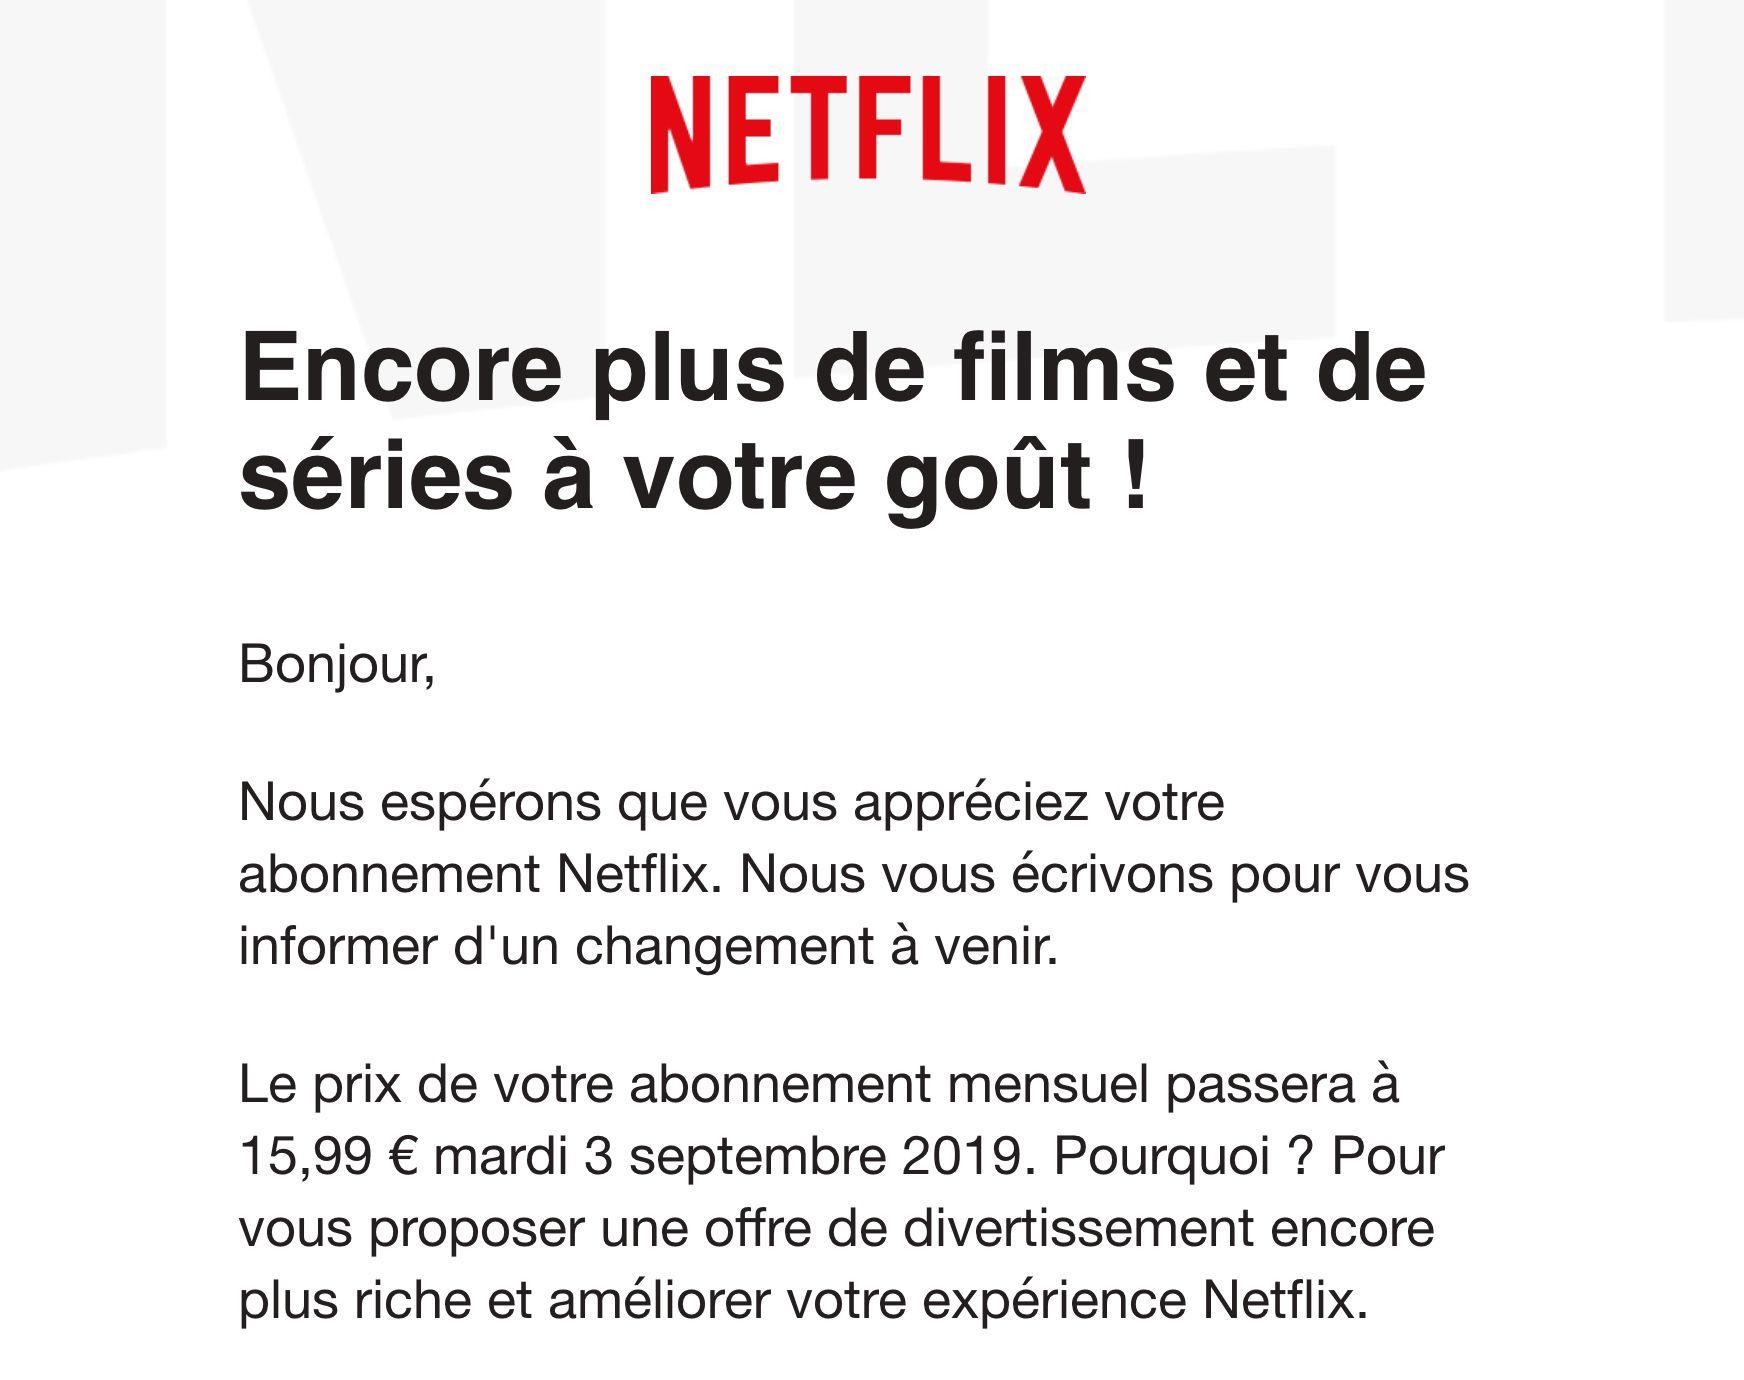 Netflix prijsverhoging Nederland Europa